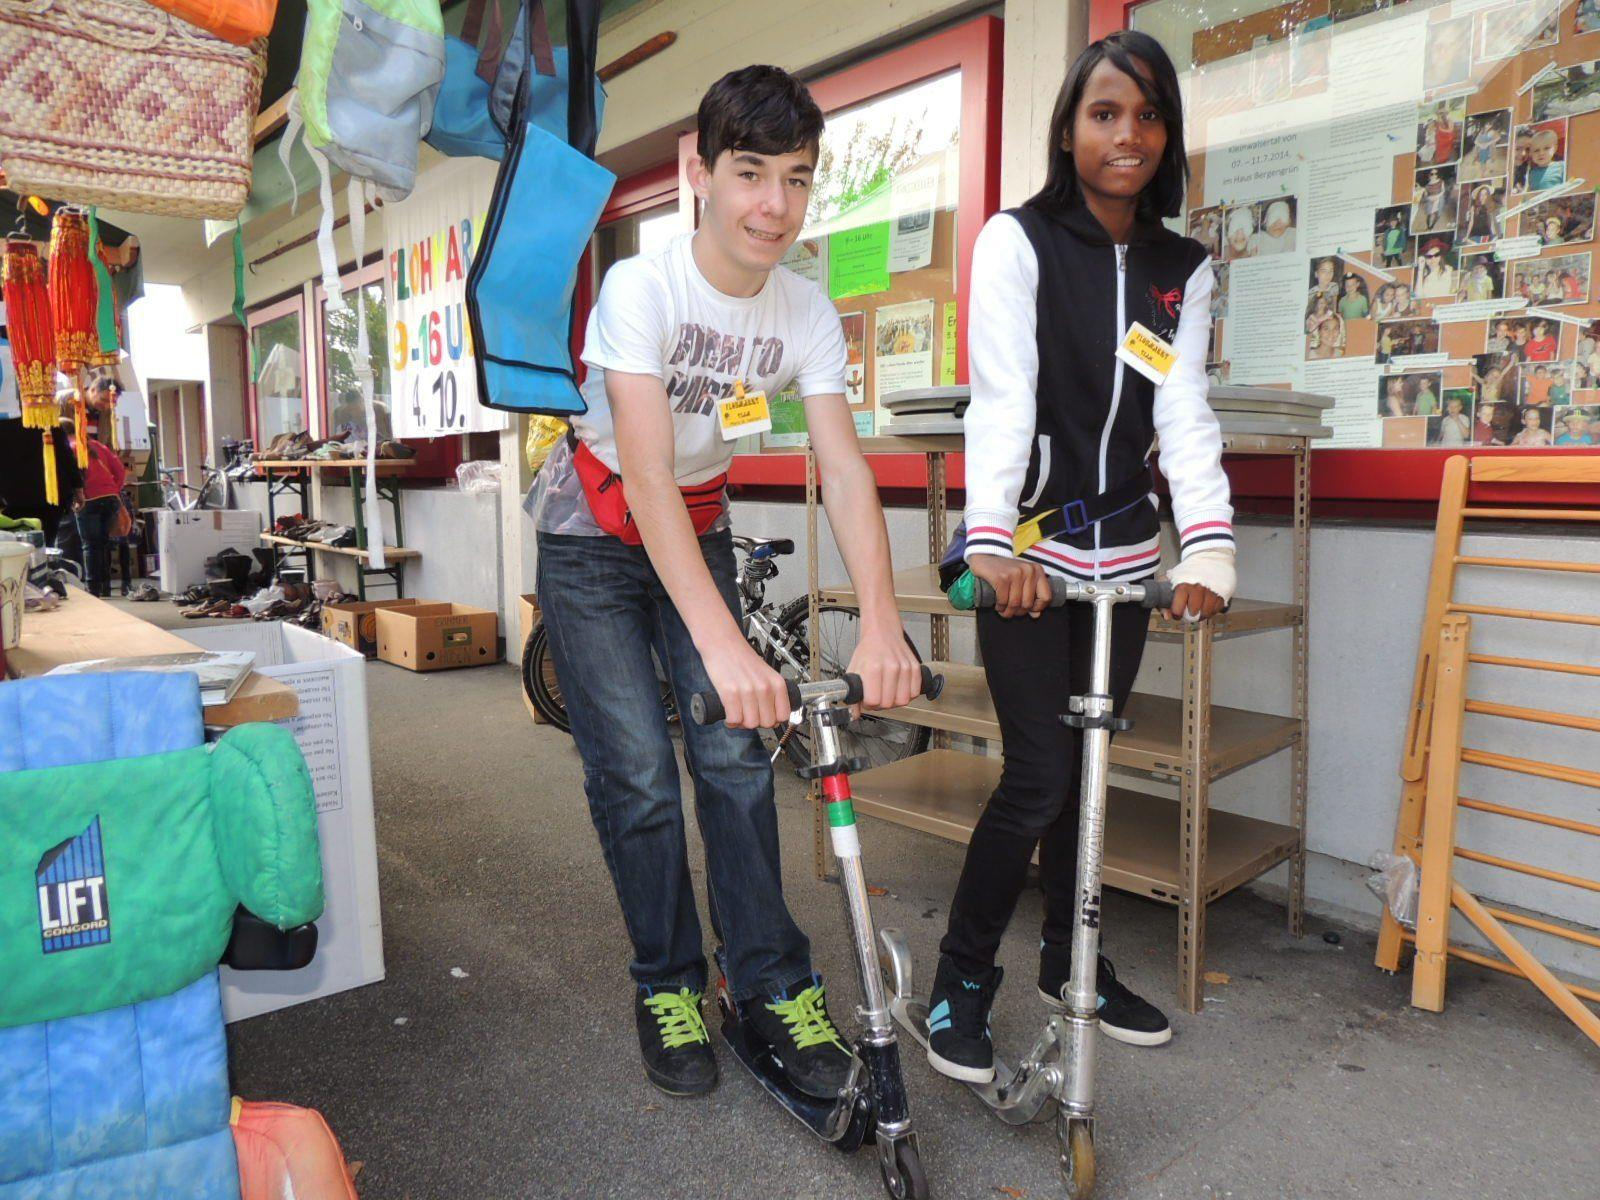 Pascal und Sunnita als fleißige Flohmarktverkäufer